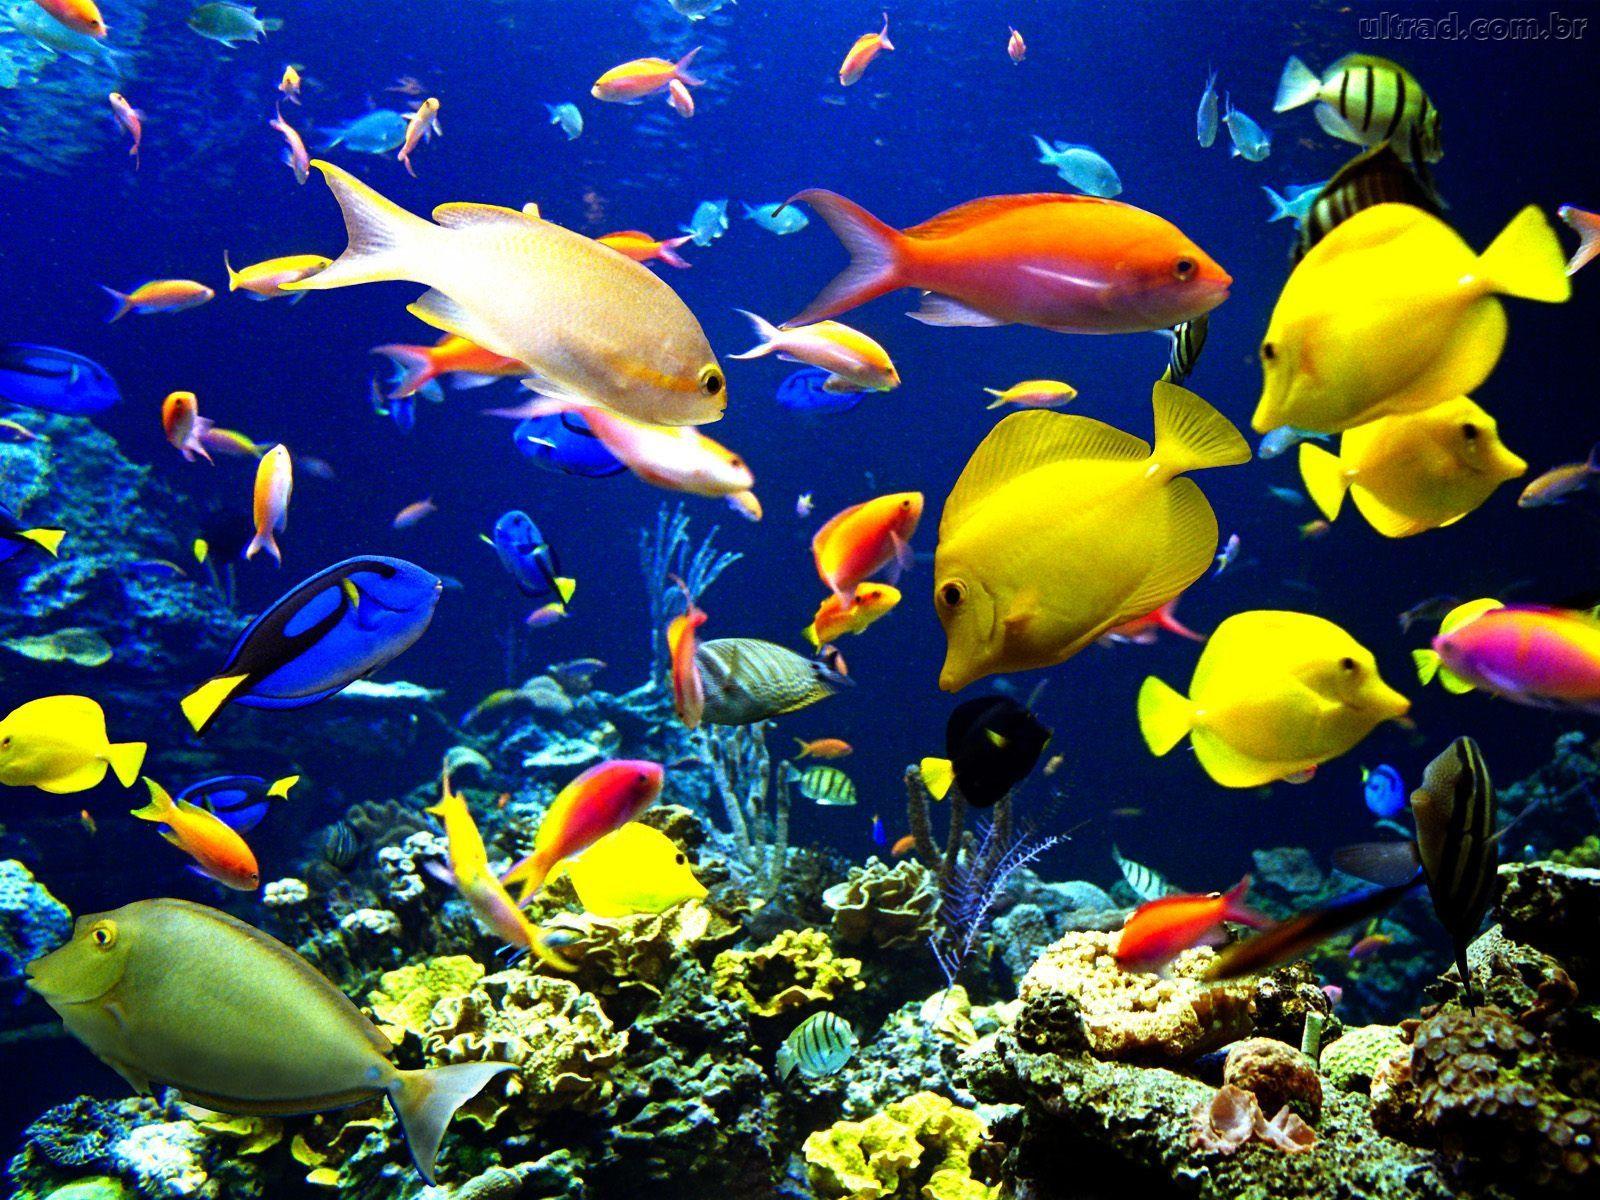 Fish Coral Reef Life